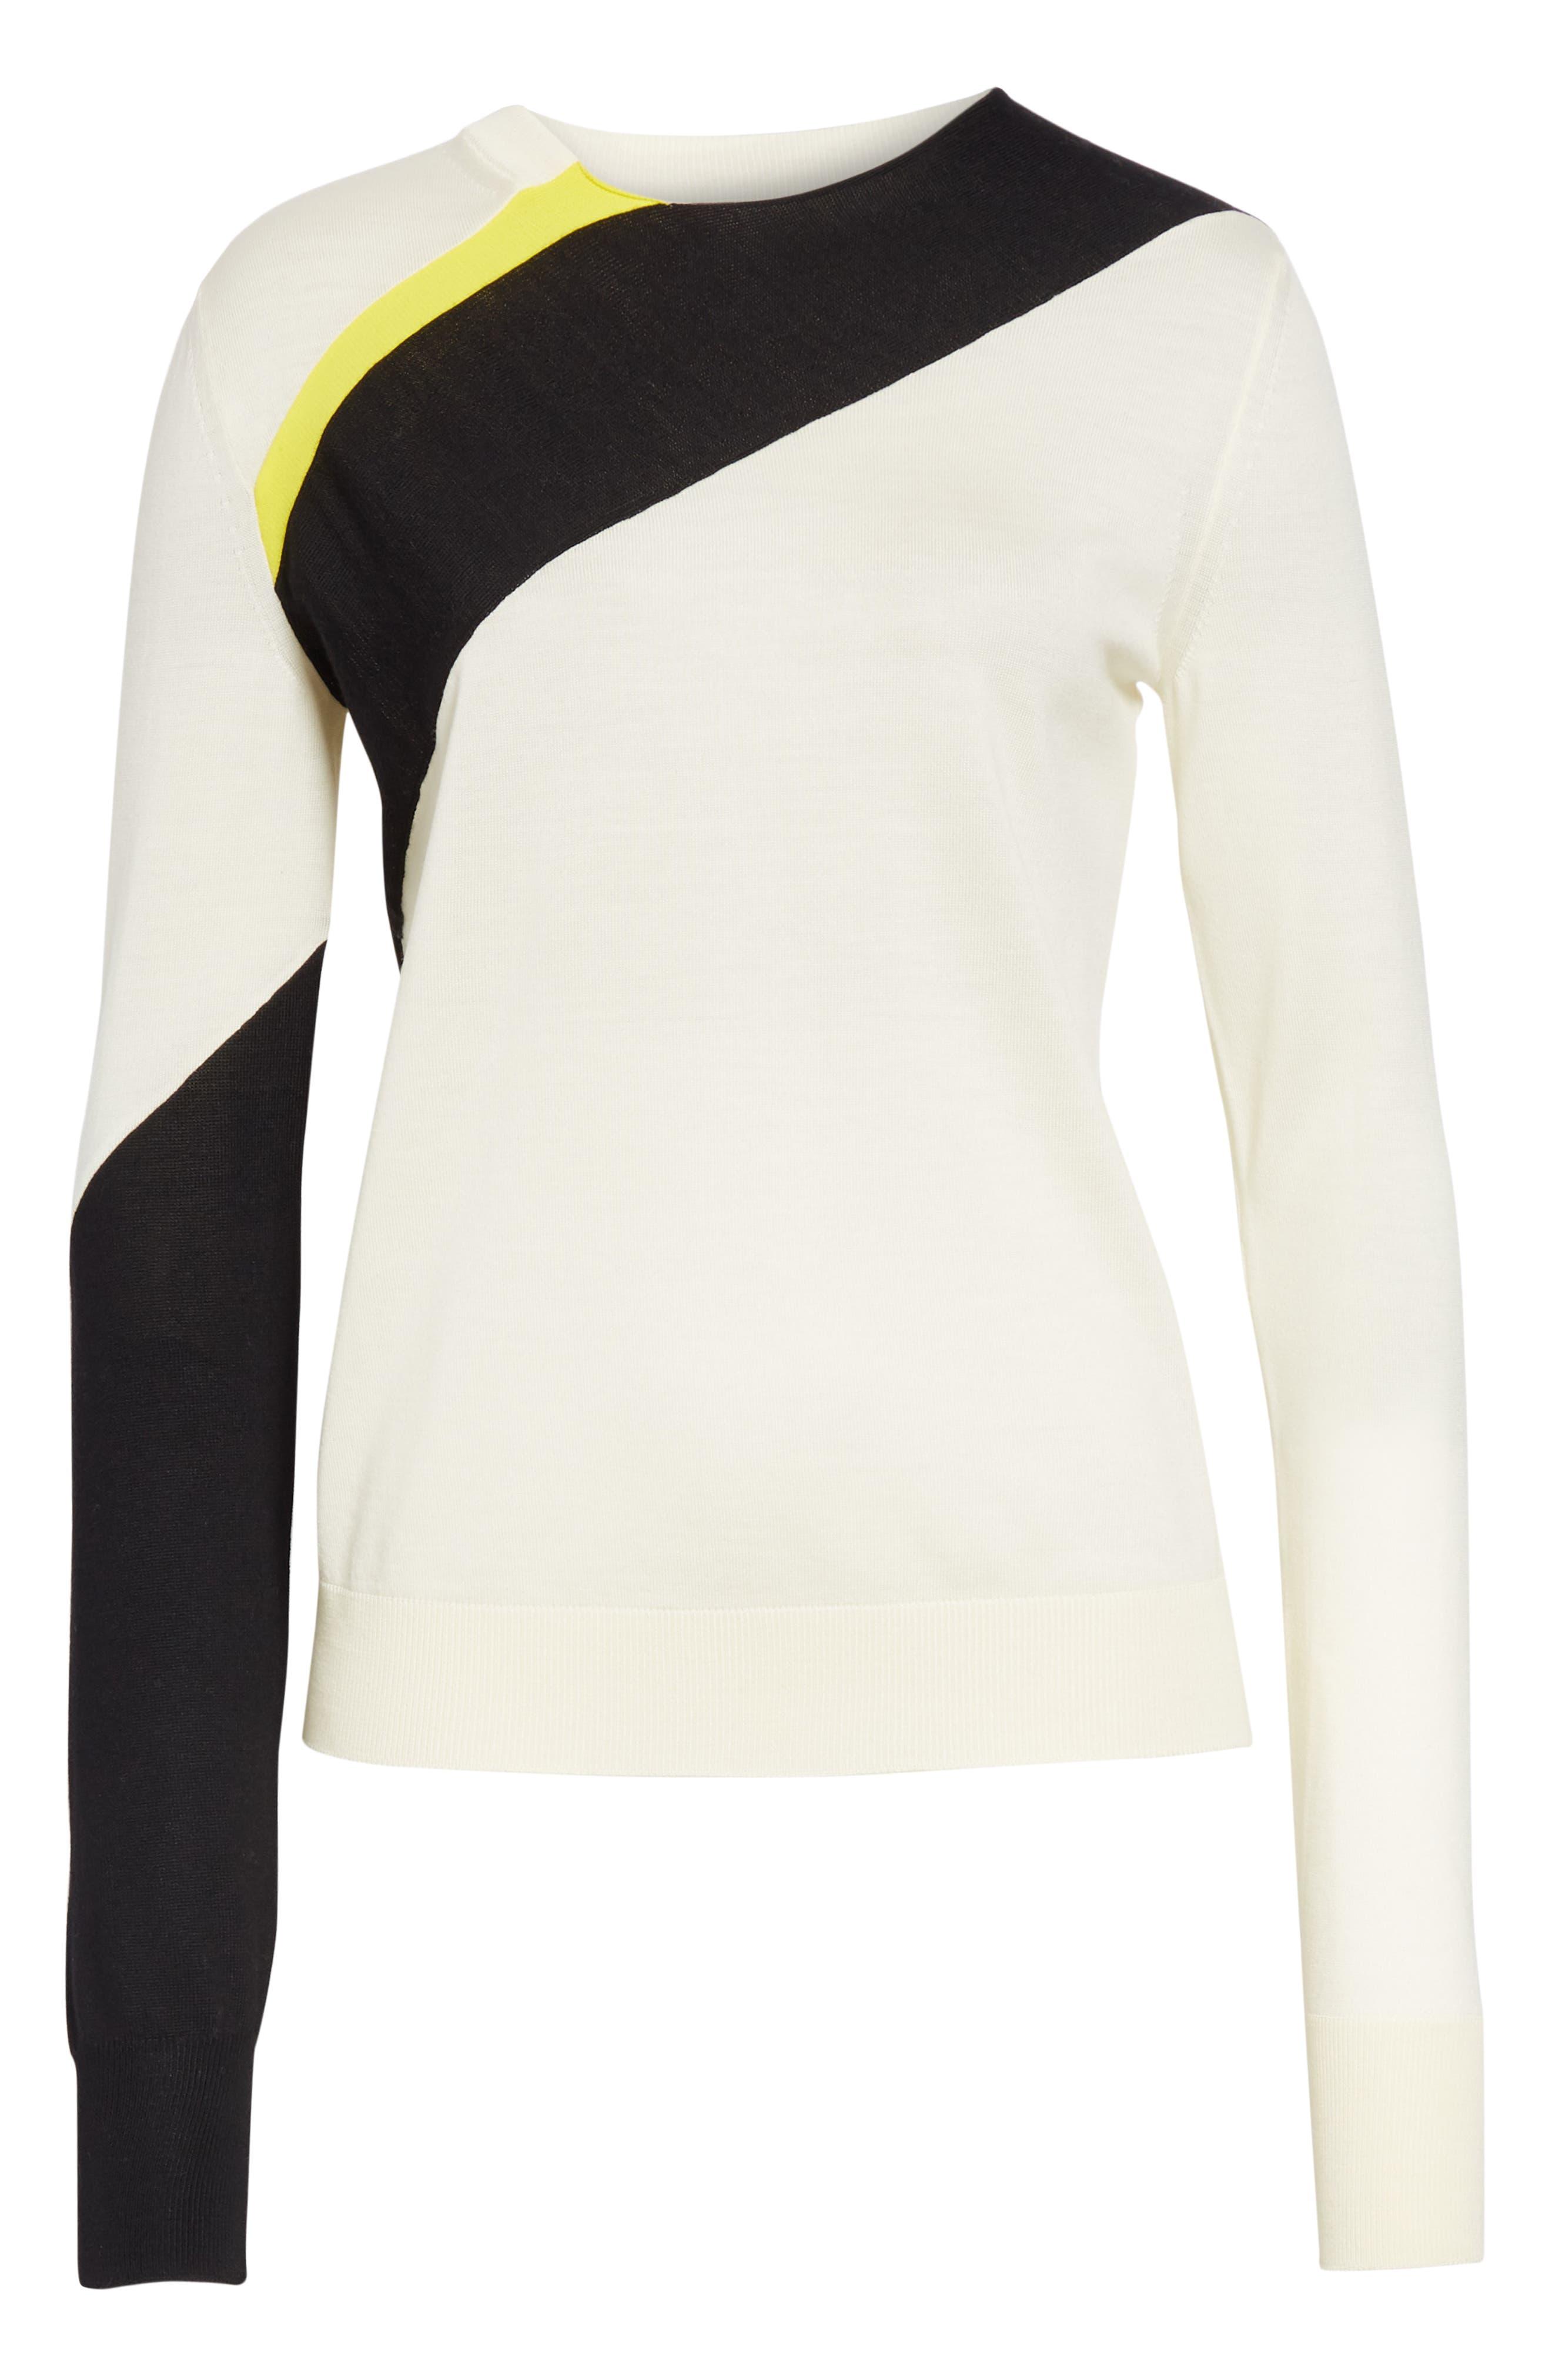 CALVIN KLEIN 205W39NYC, Contrast Stripe Wool Blend Sweater, Alternate thumbnail 7, color, WHITE BLACK TOURNESOL